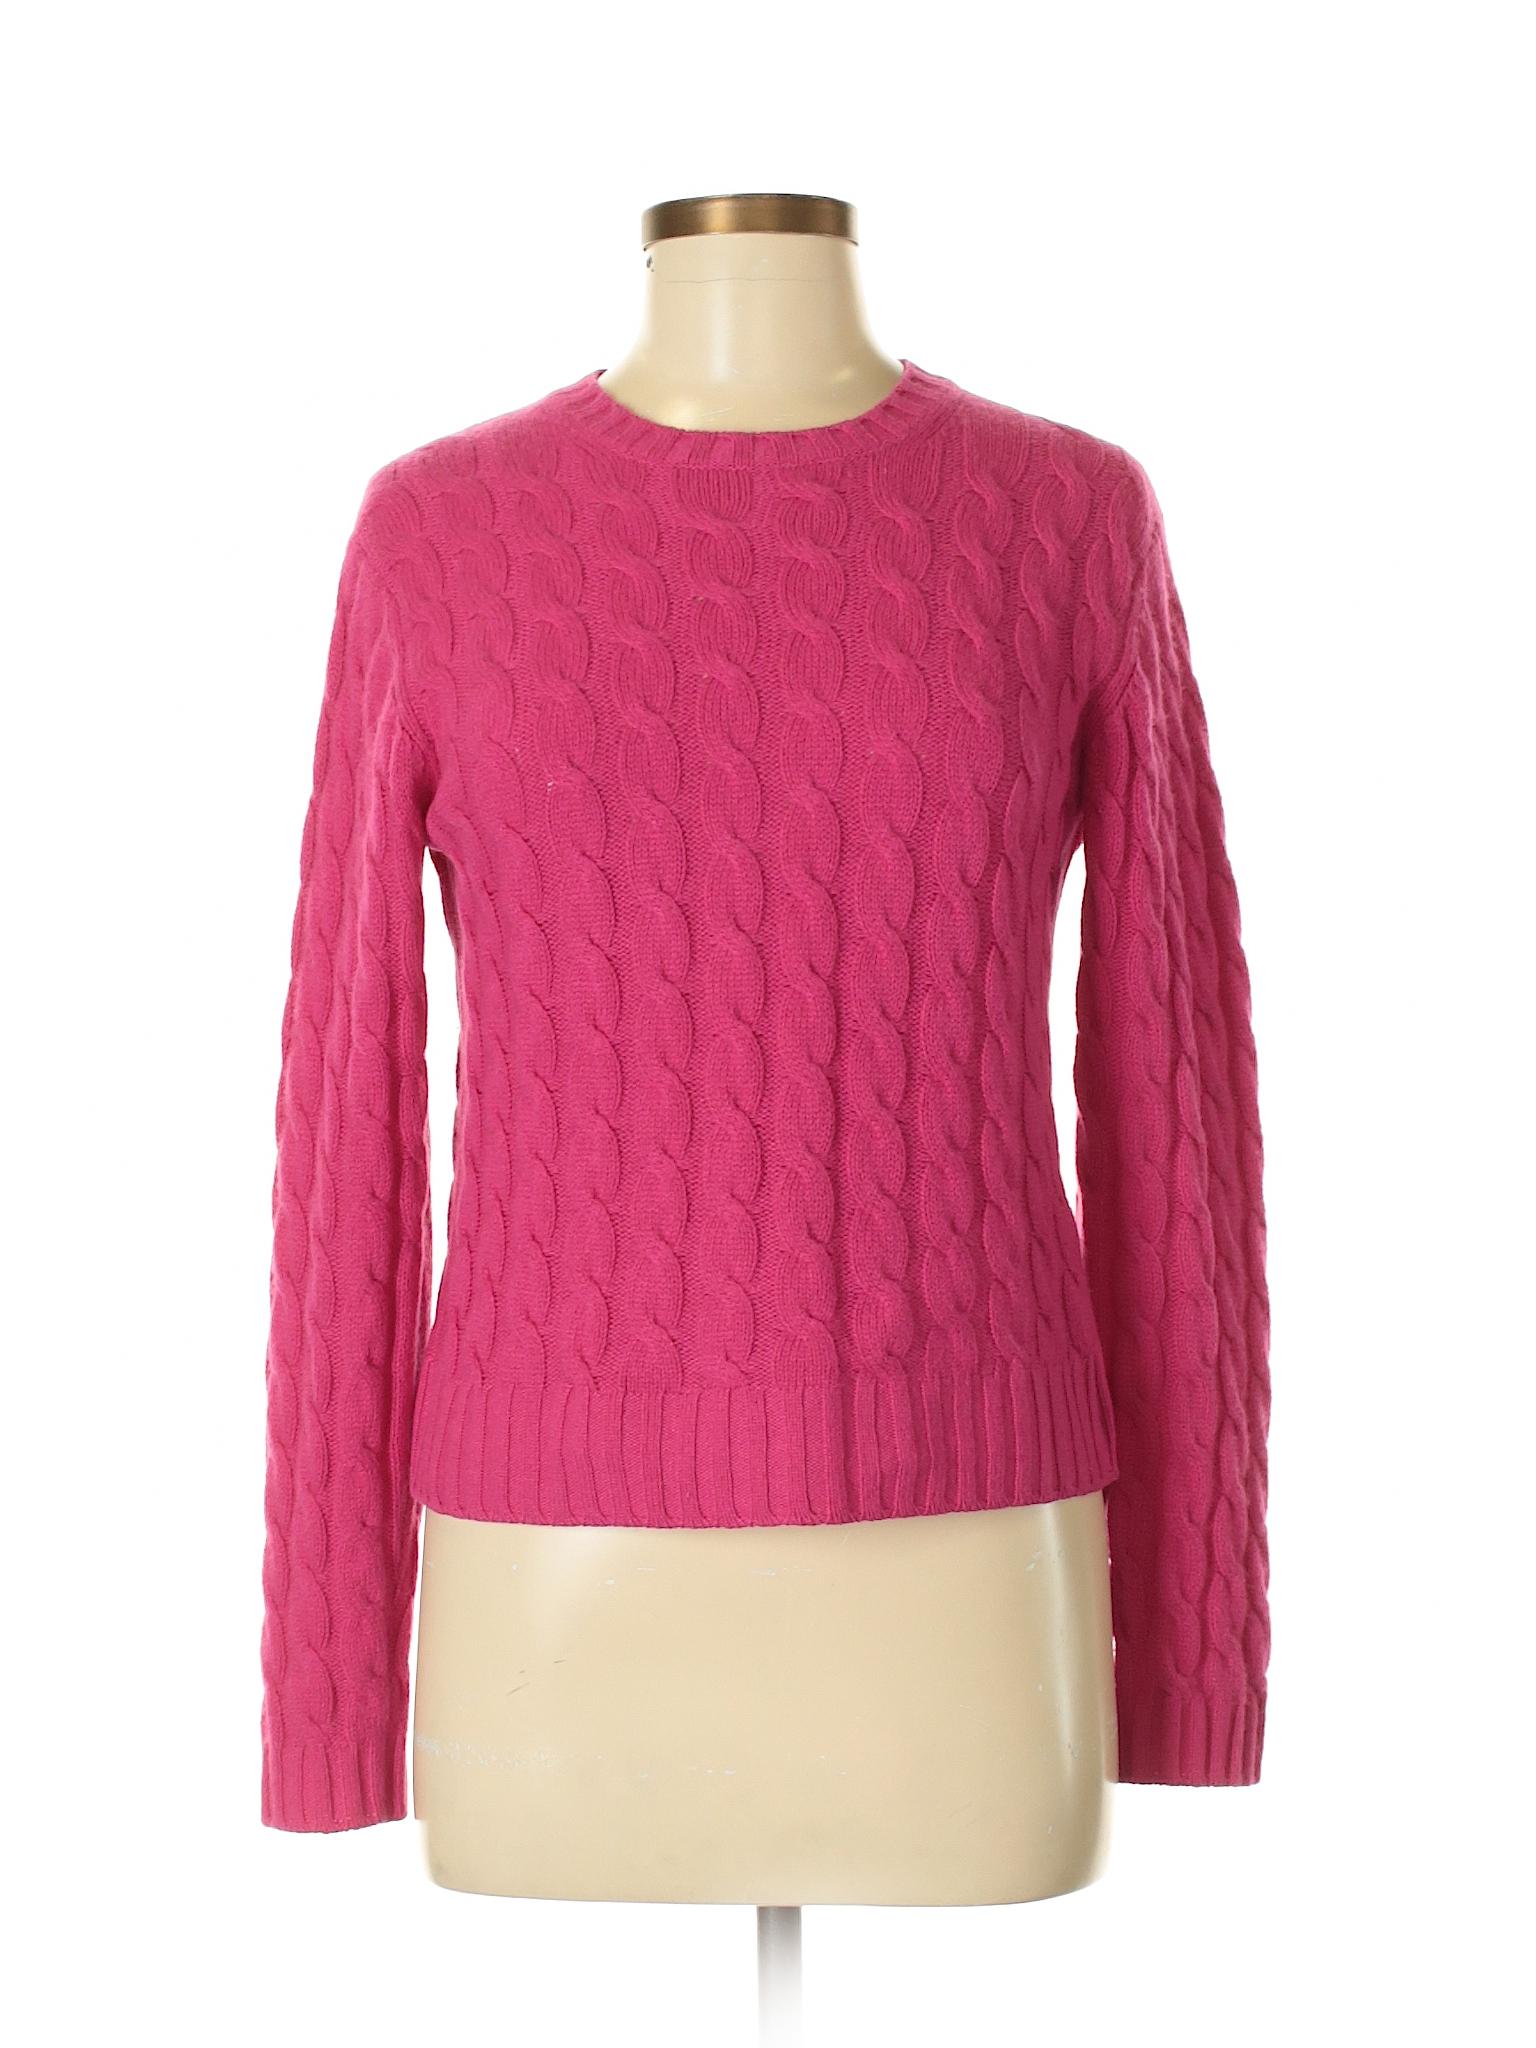 Pullover Boutique Burberry Burberry Cashmere Sweater Pullover Boutique Cashmere x4q8CYwH